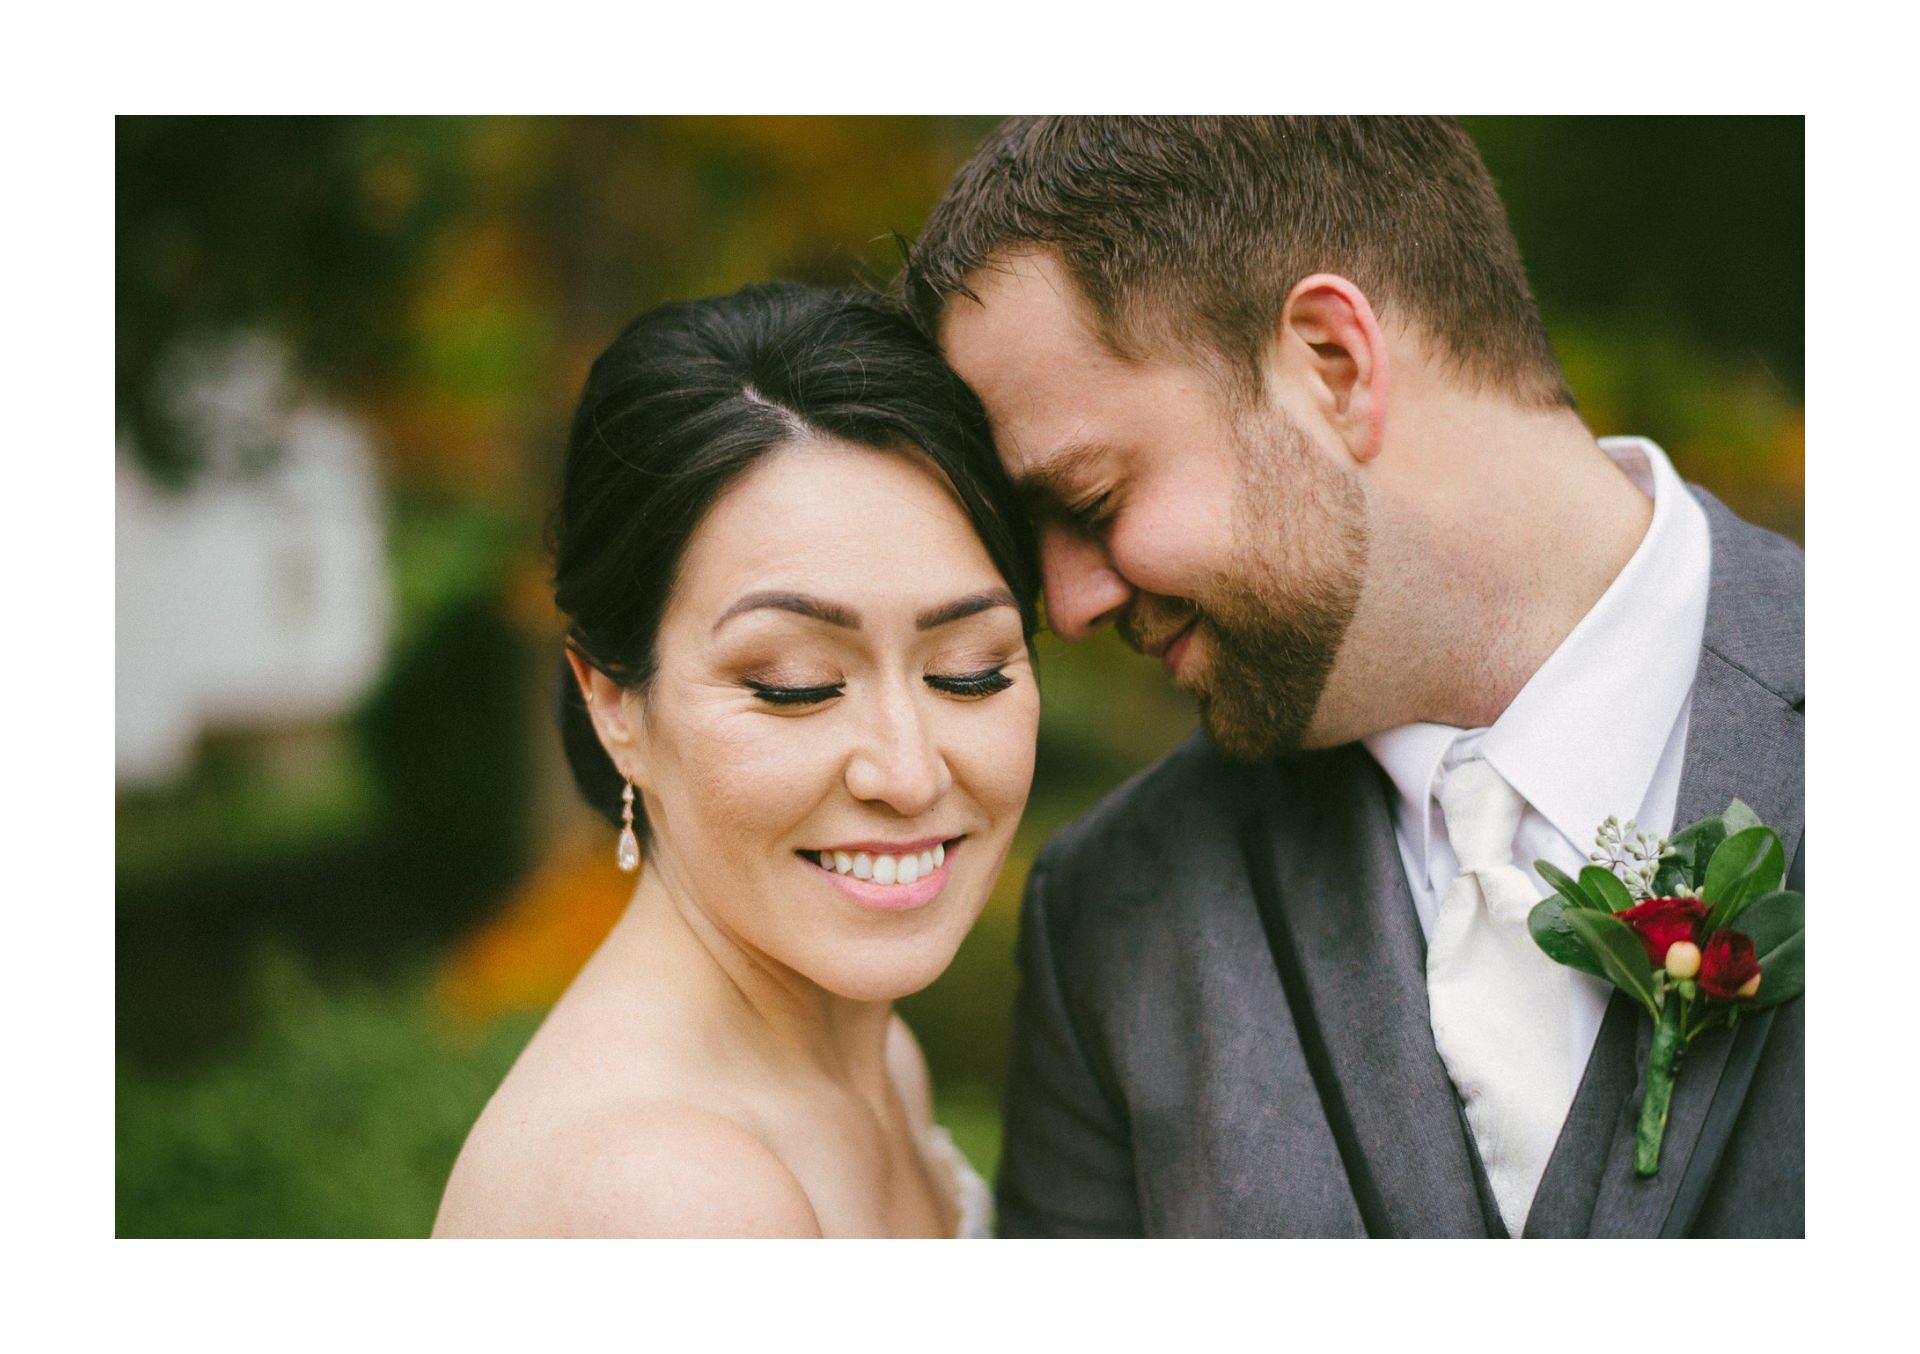 Patterson Fruit Farm Wedding Photographer in Cleveland 1 46.jpg